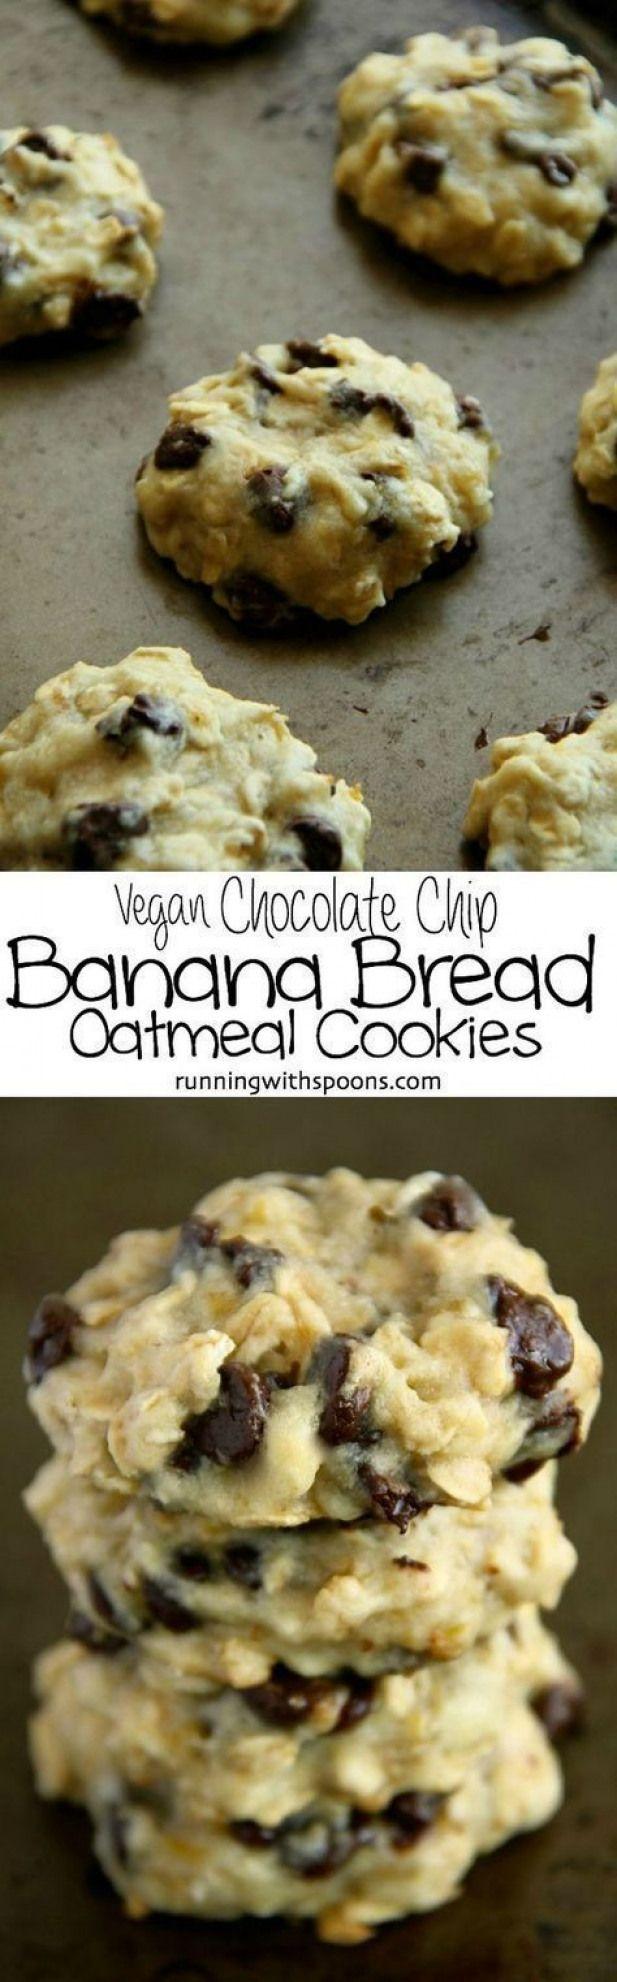 Buzzfeed Vegan Chocolate Chip Vegan Desserts Recipes